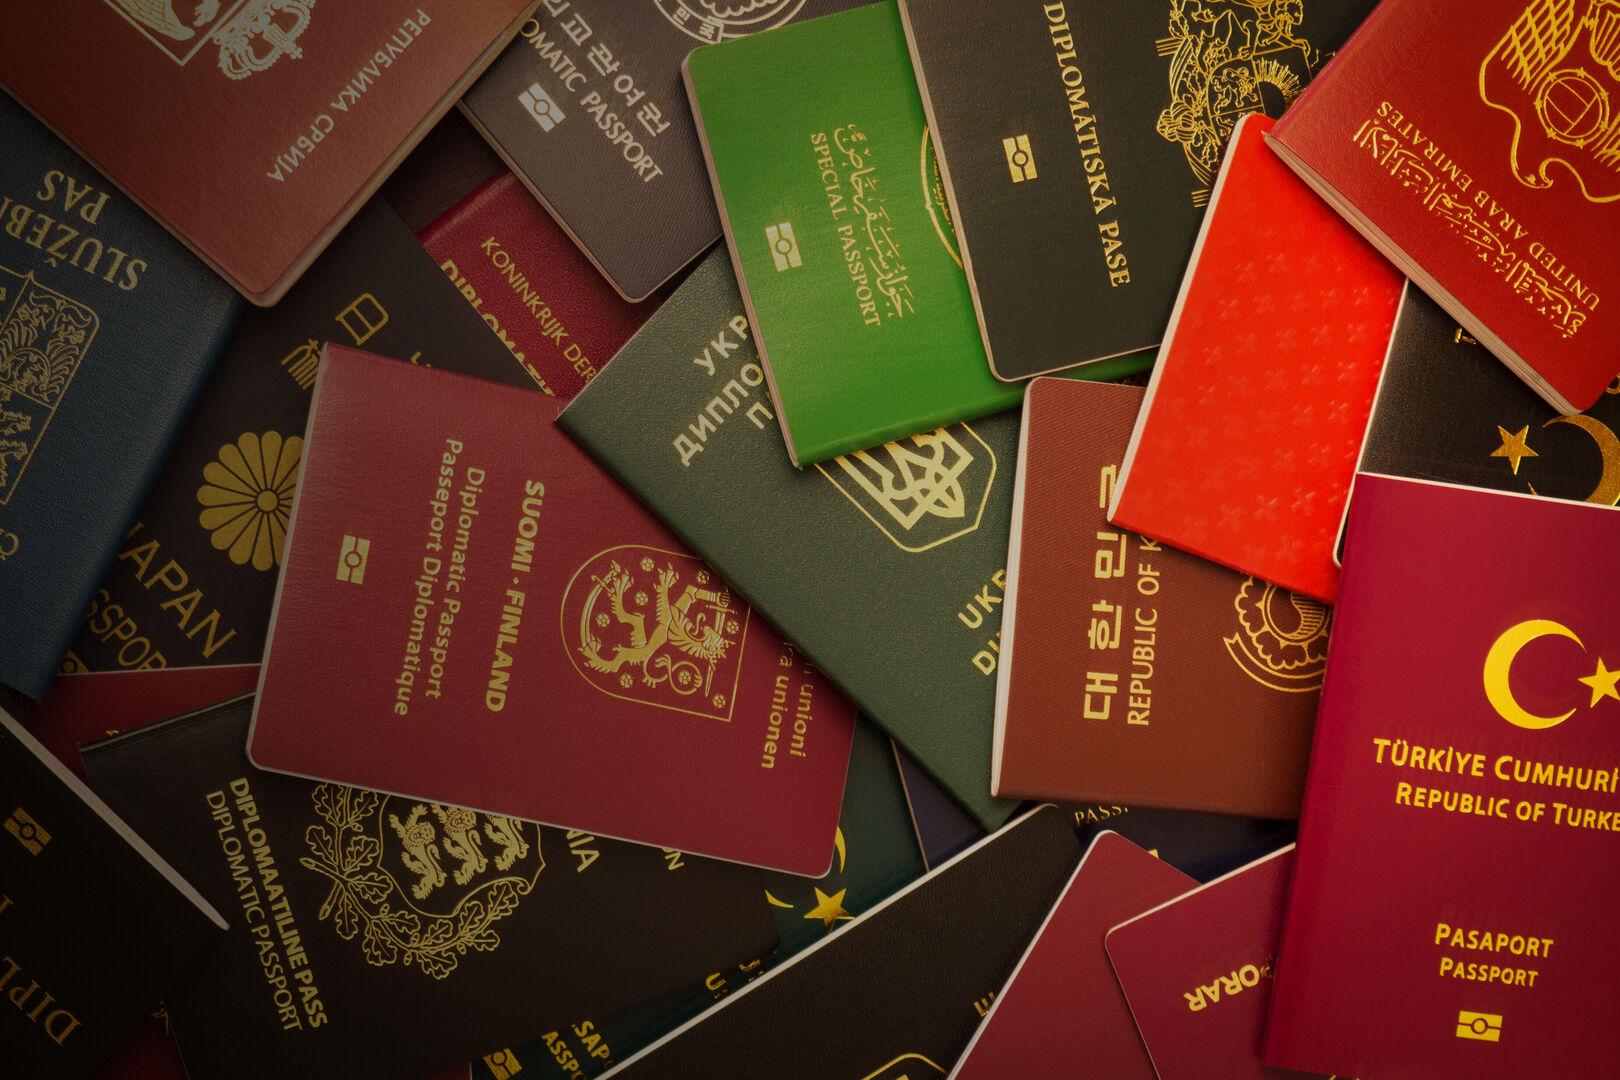 Ban copy of passport